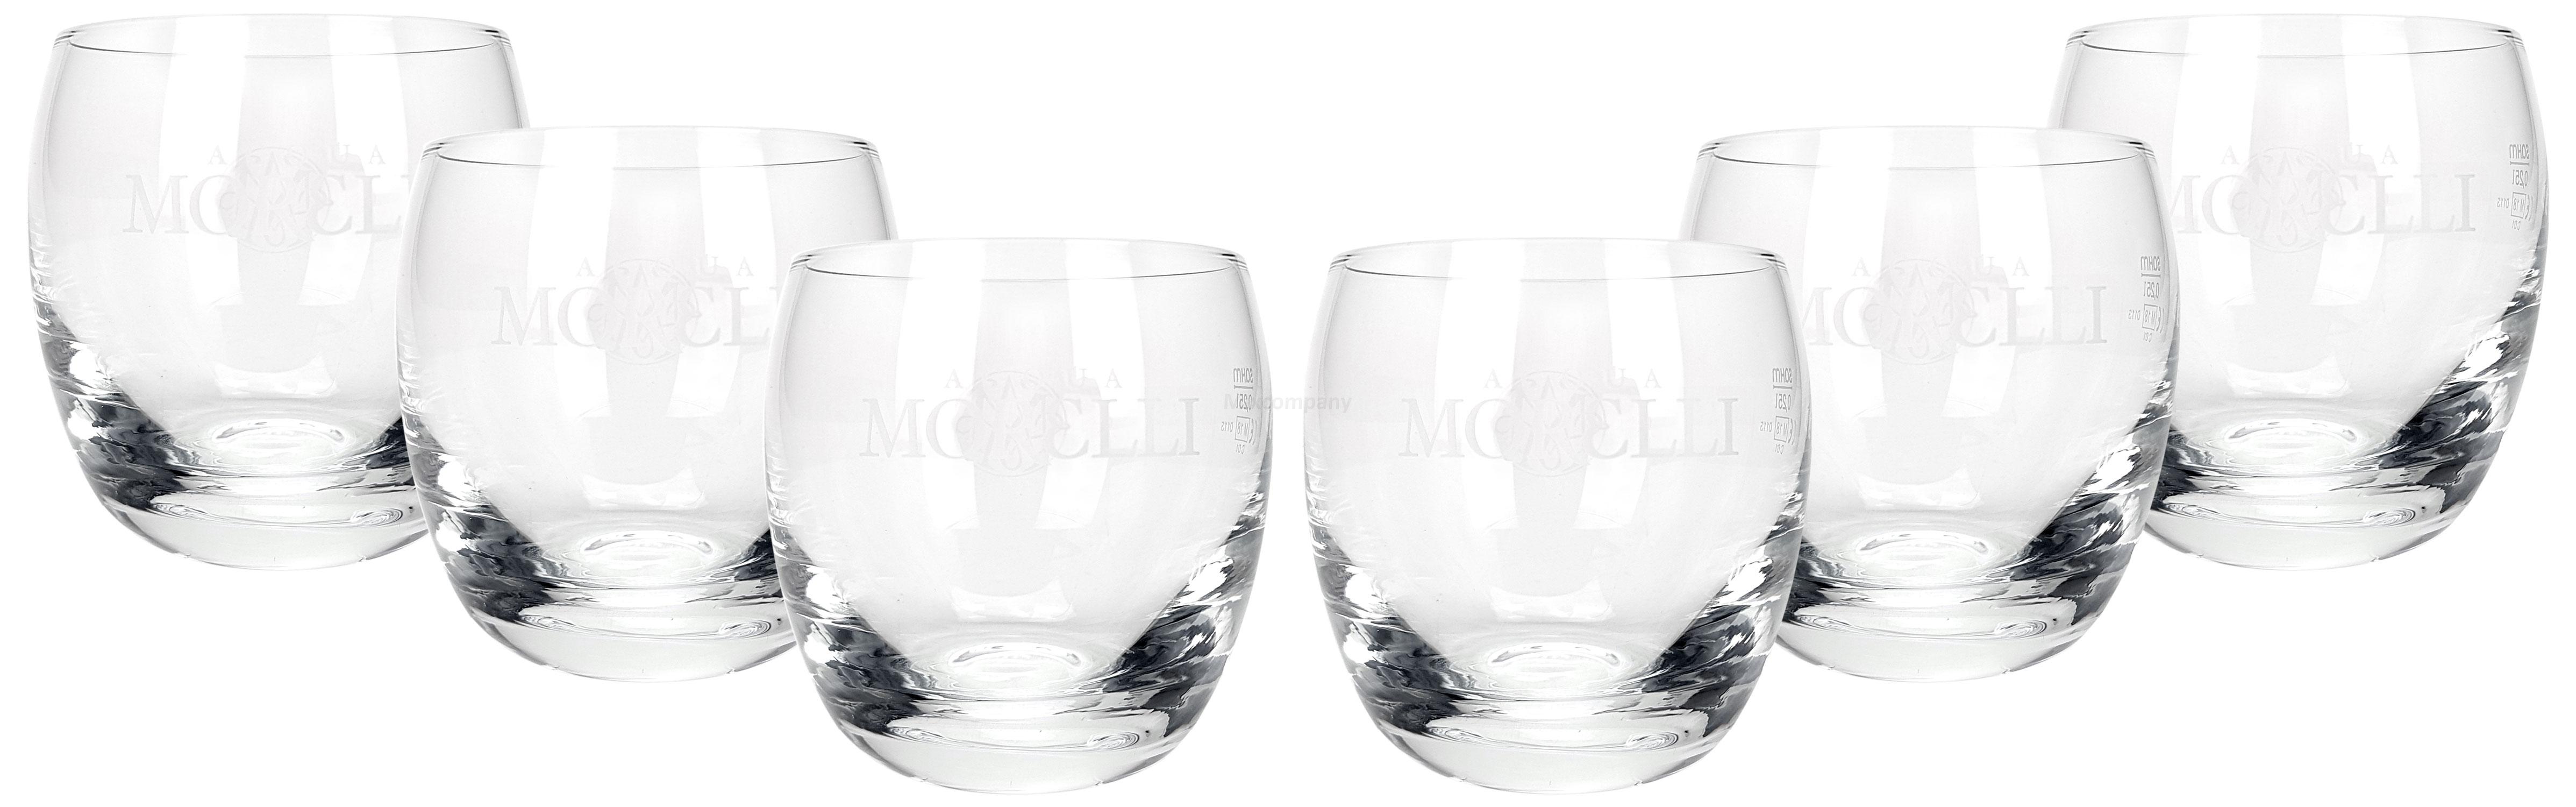 Acqua Morelli Glas Gläser Set - 6x Tumbler 0,25l geeicht